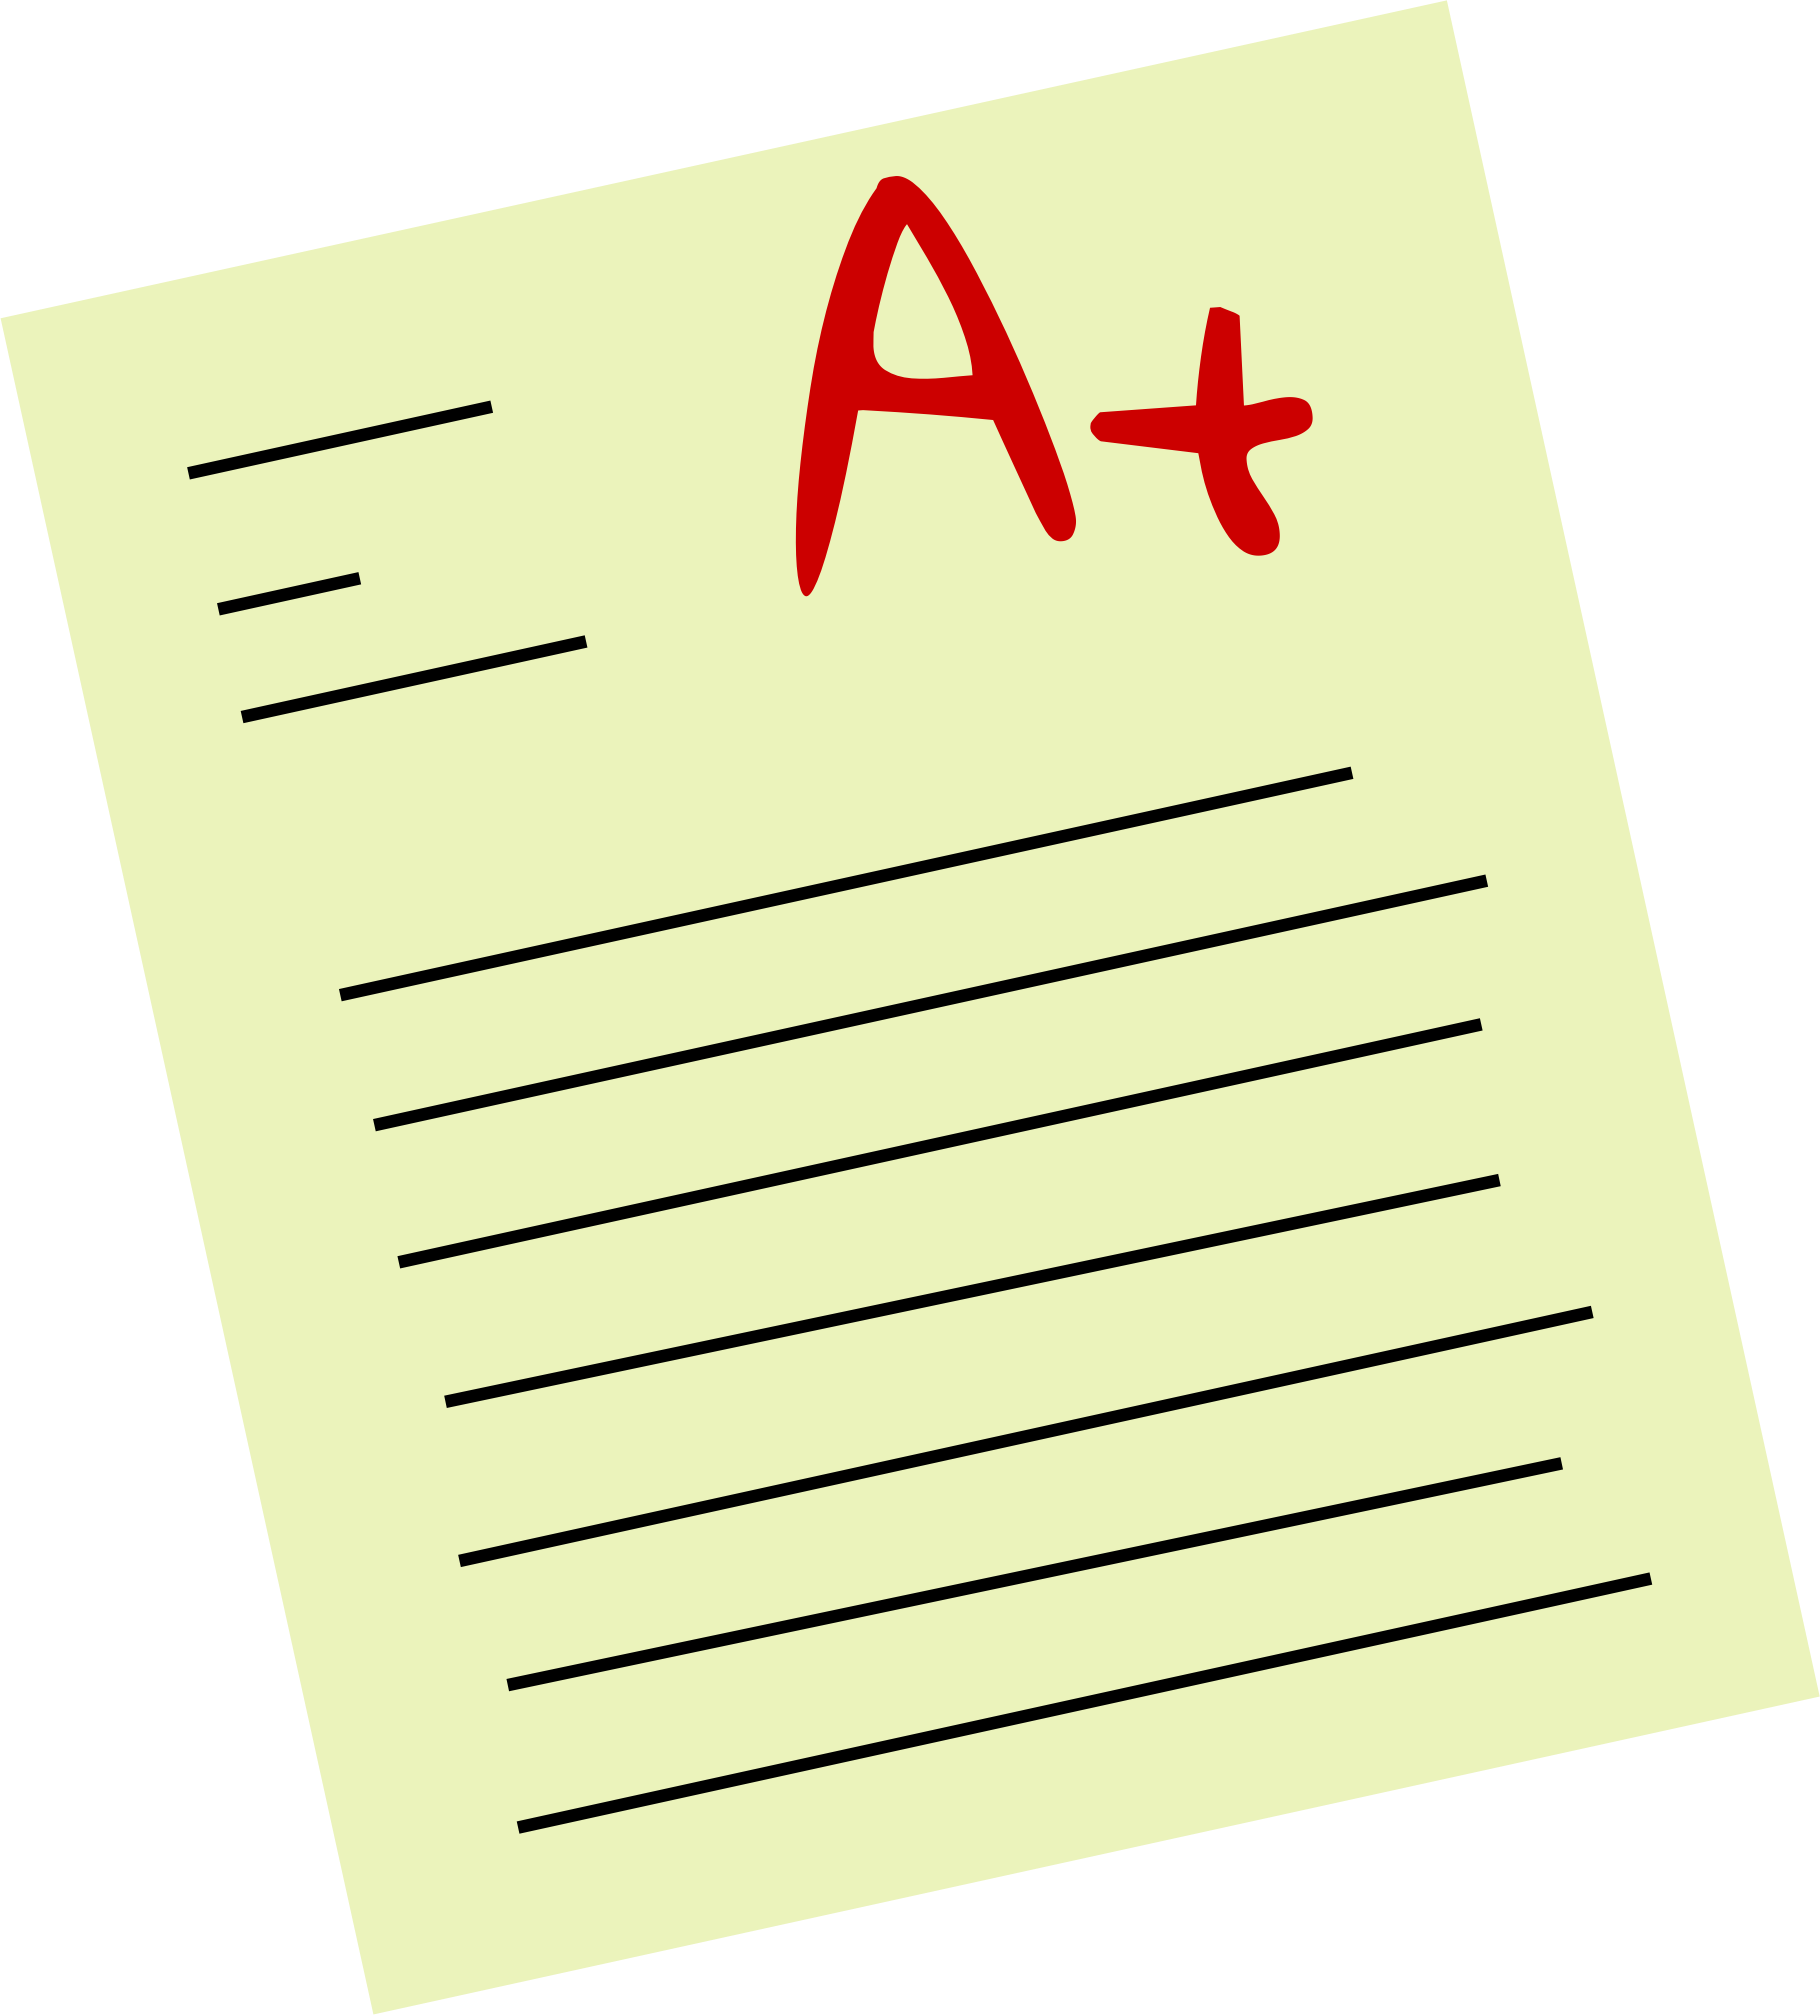 Essay clipart test paper, Essay test paper Transparent FREE.